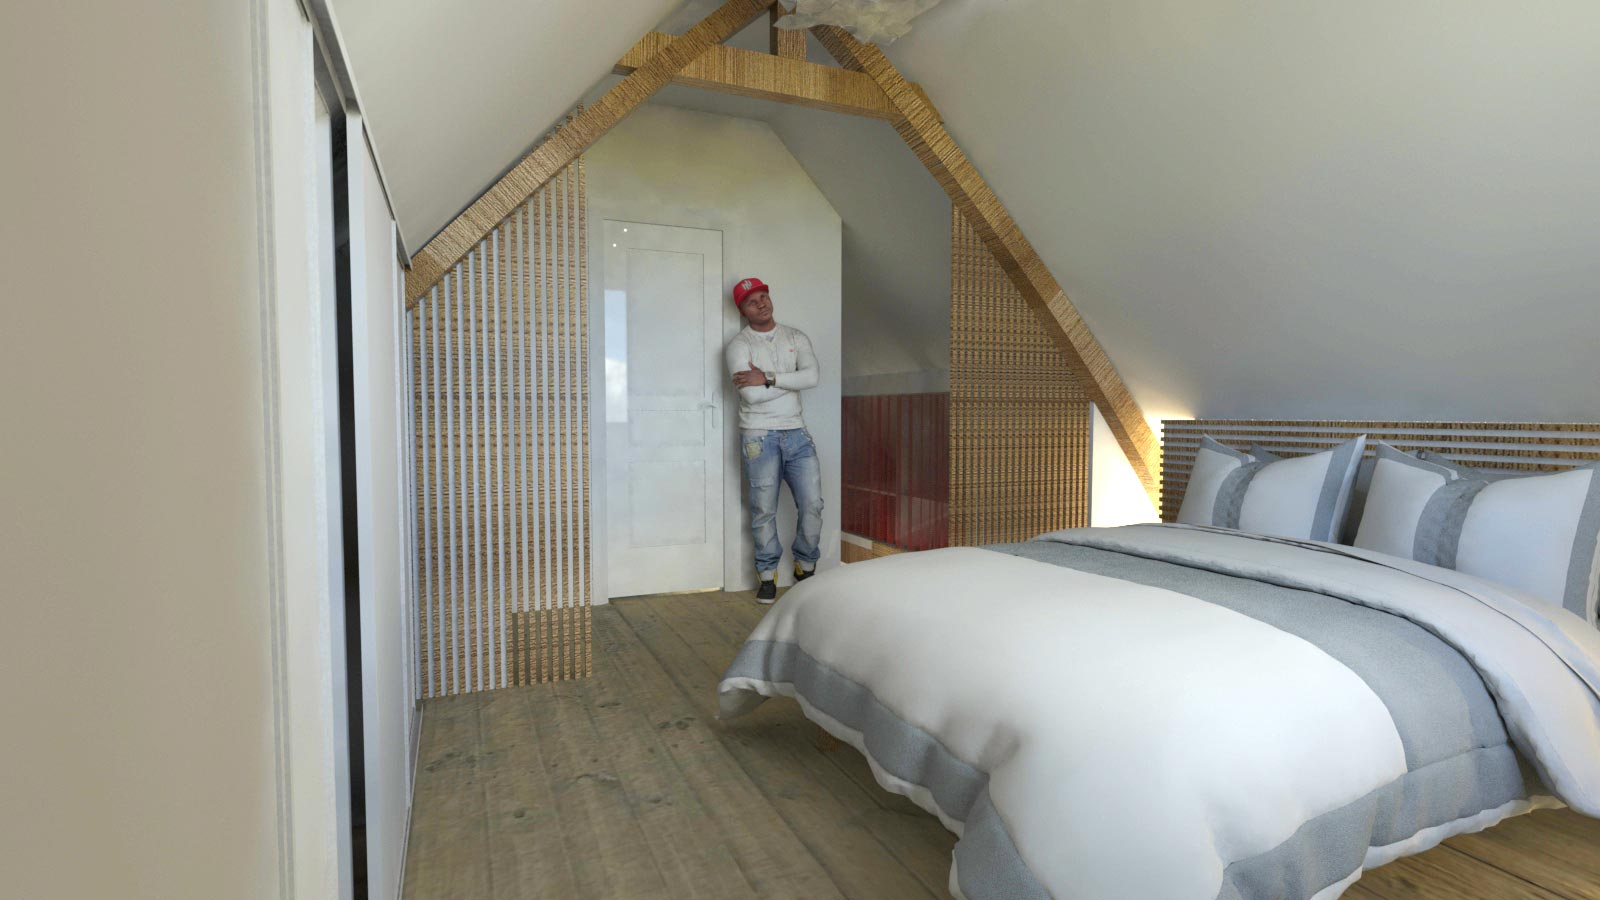 circulation d coration et lumi re architectswaves. Black Bedroom Furniture Sets. Home Design Ideas